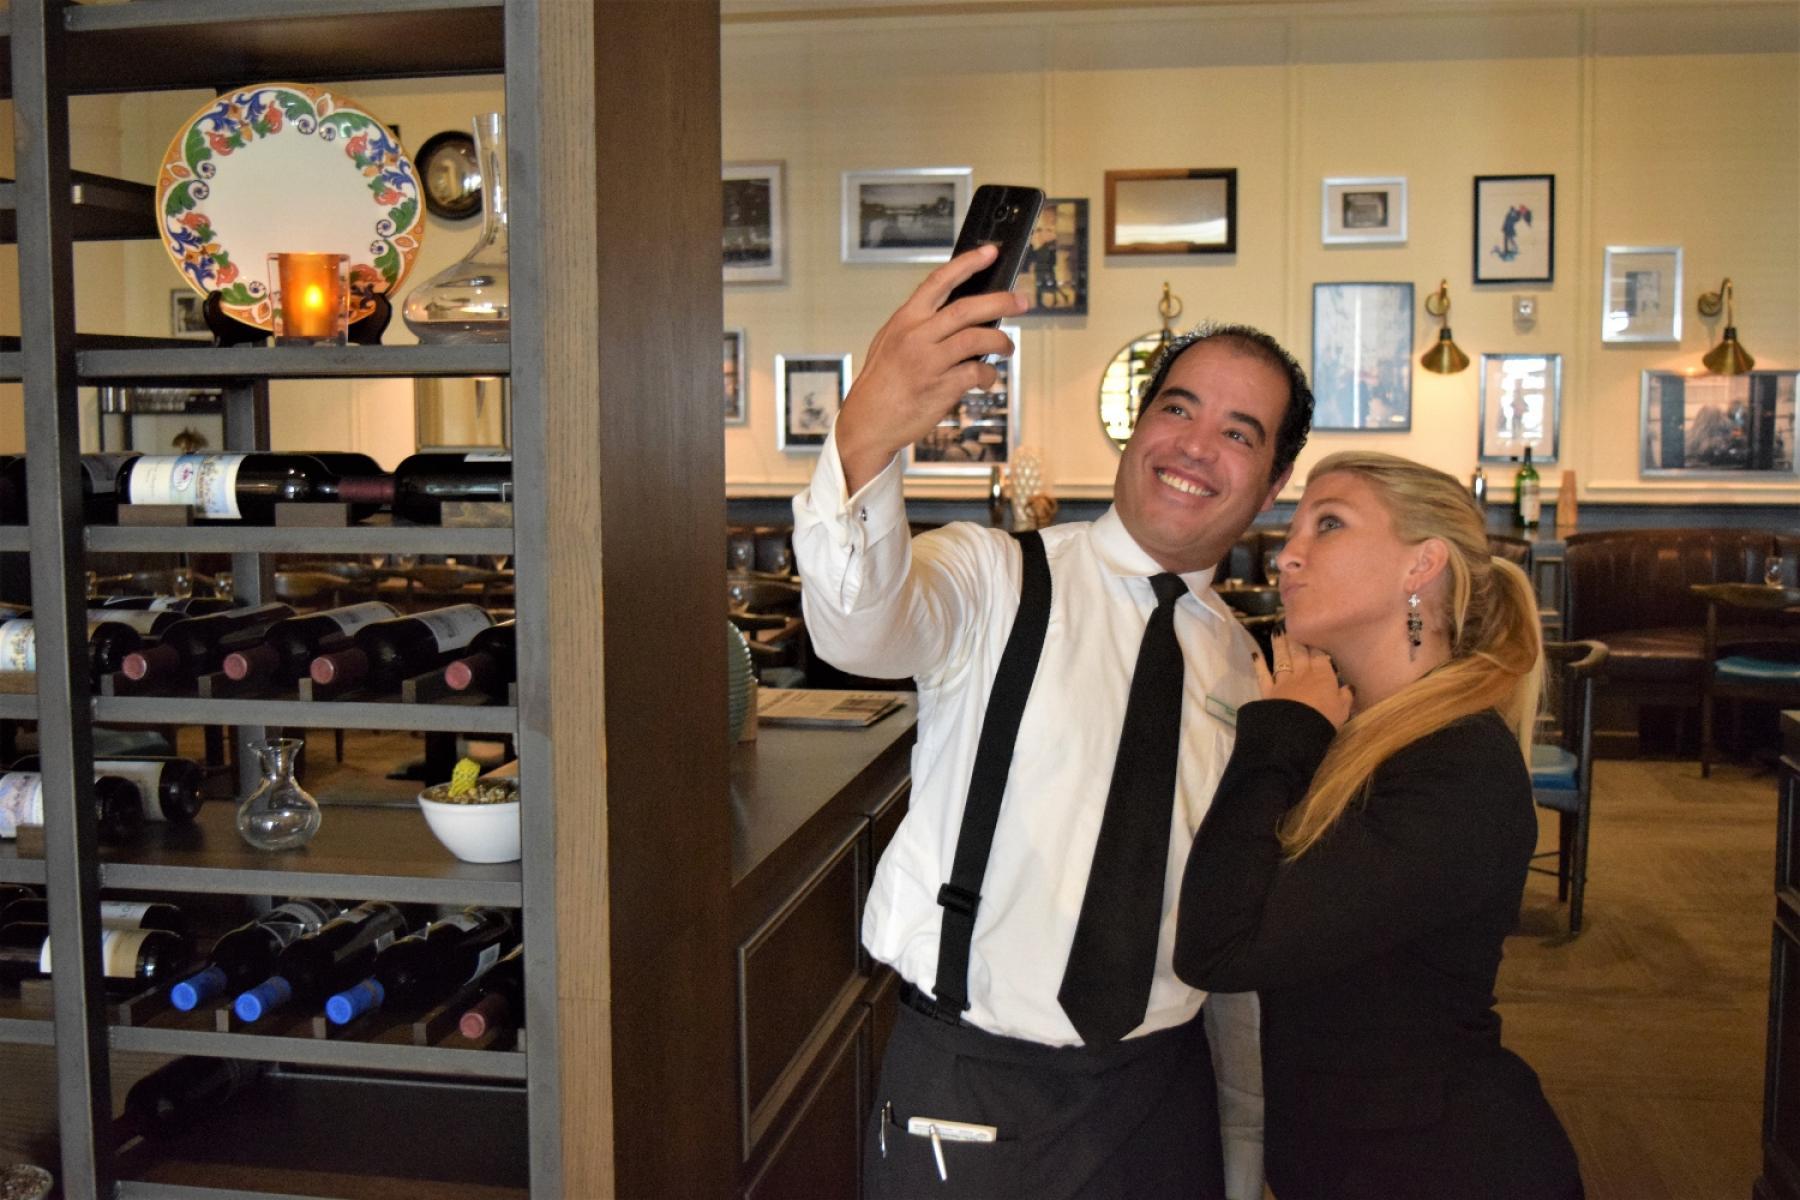 Celebrate Selfie Day the Bizou Way